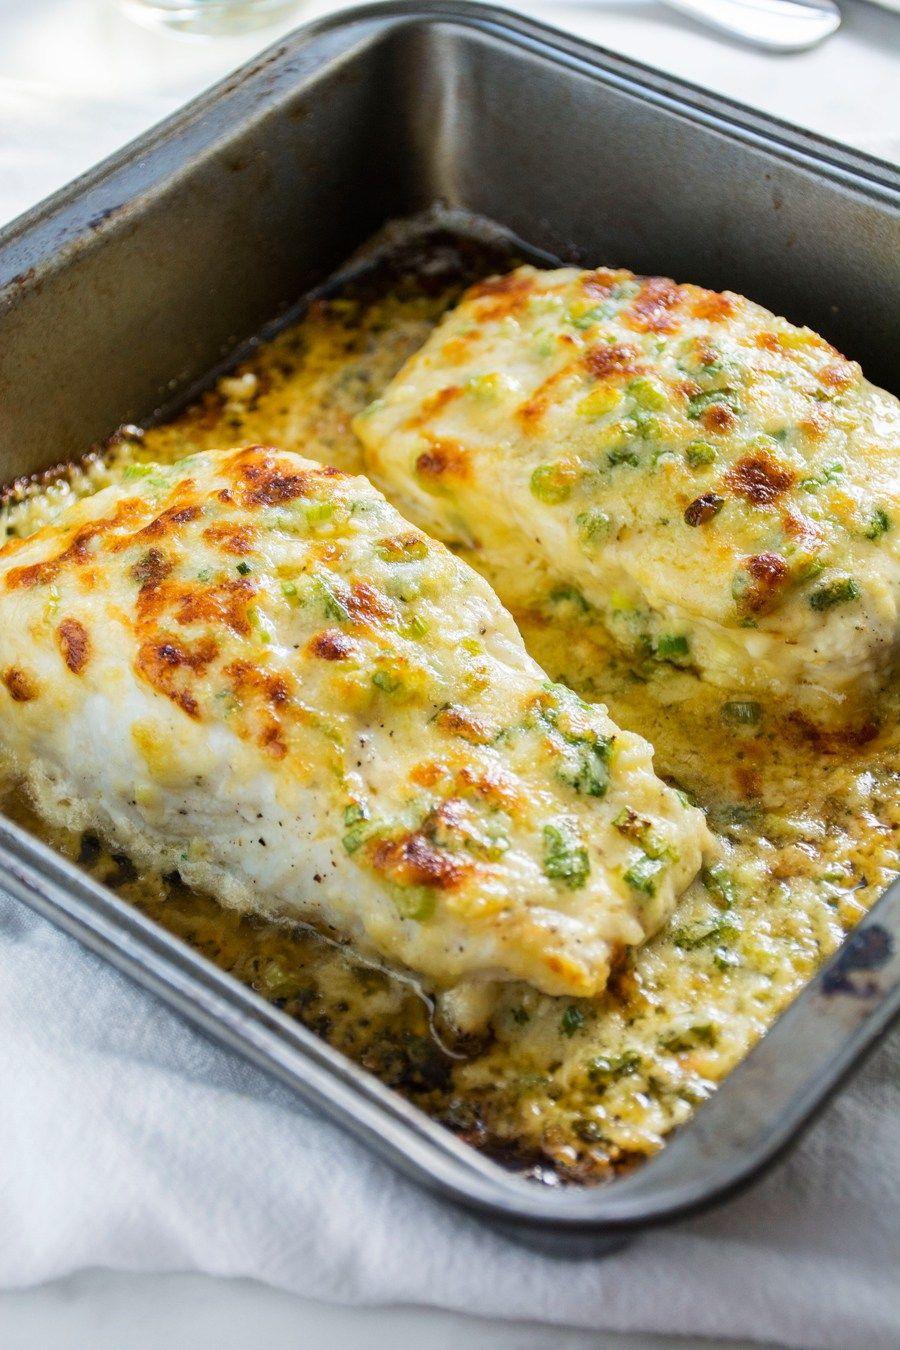 Garlic Parmesan Baked Halibut Recipe Halibut Recipes Fish Recipes Healthy Fish Recipes